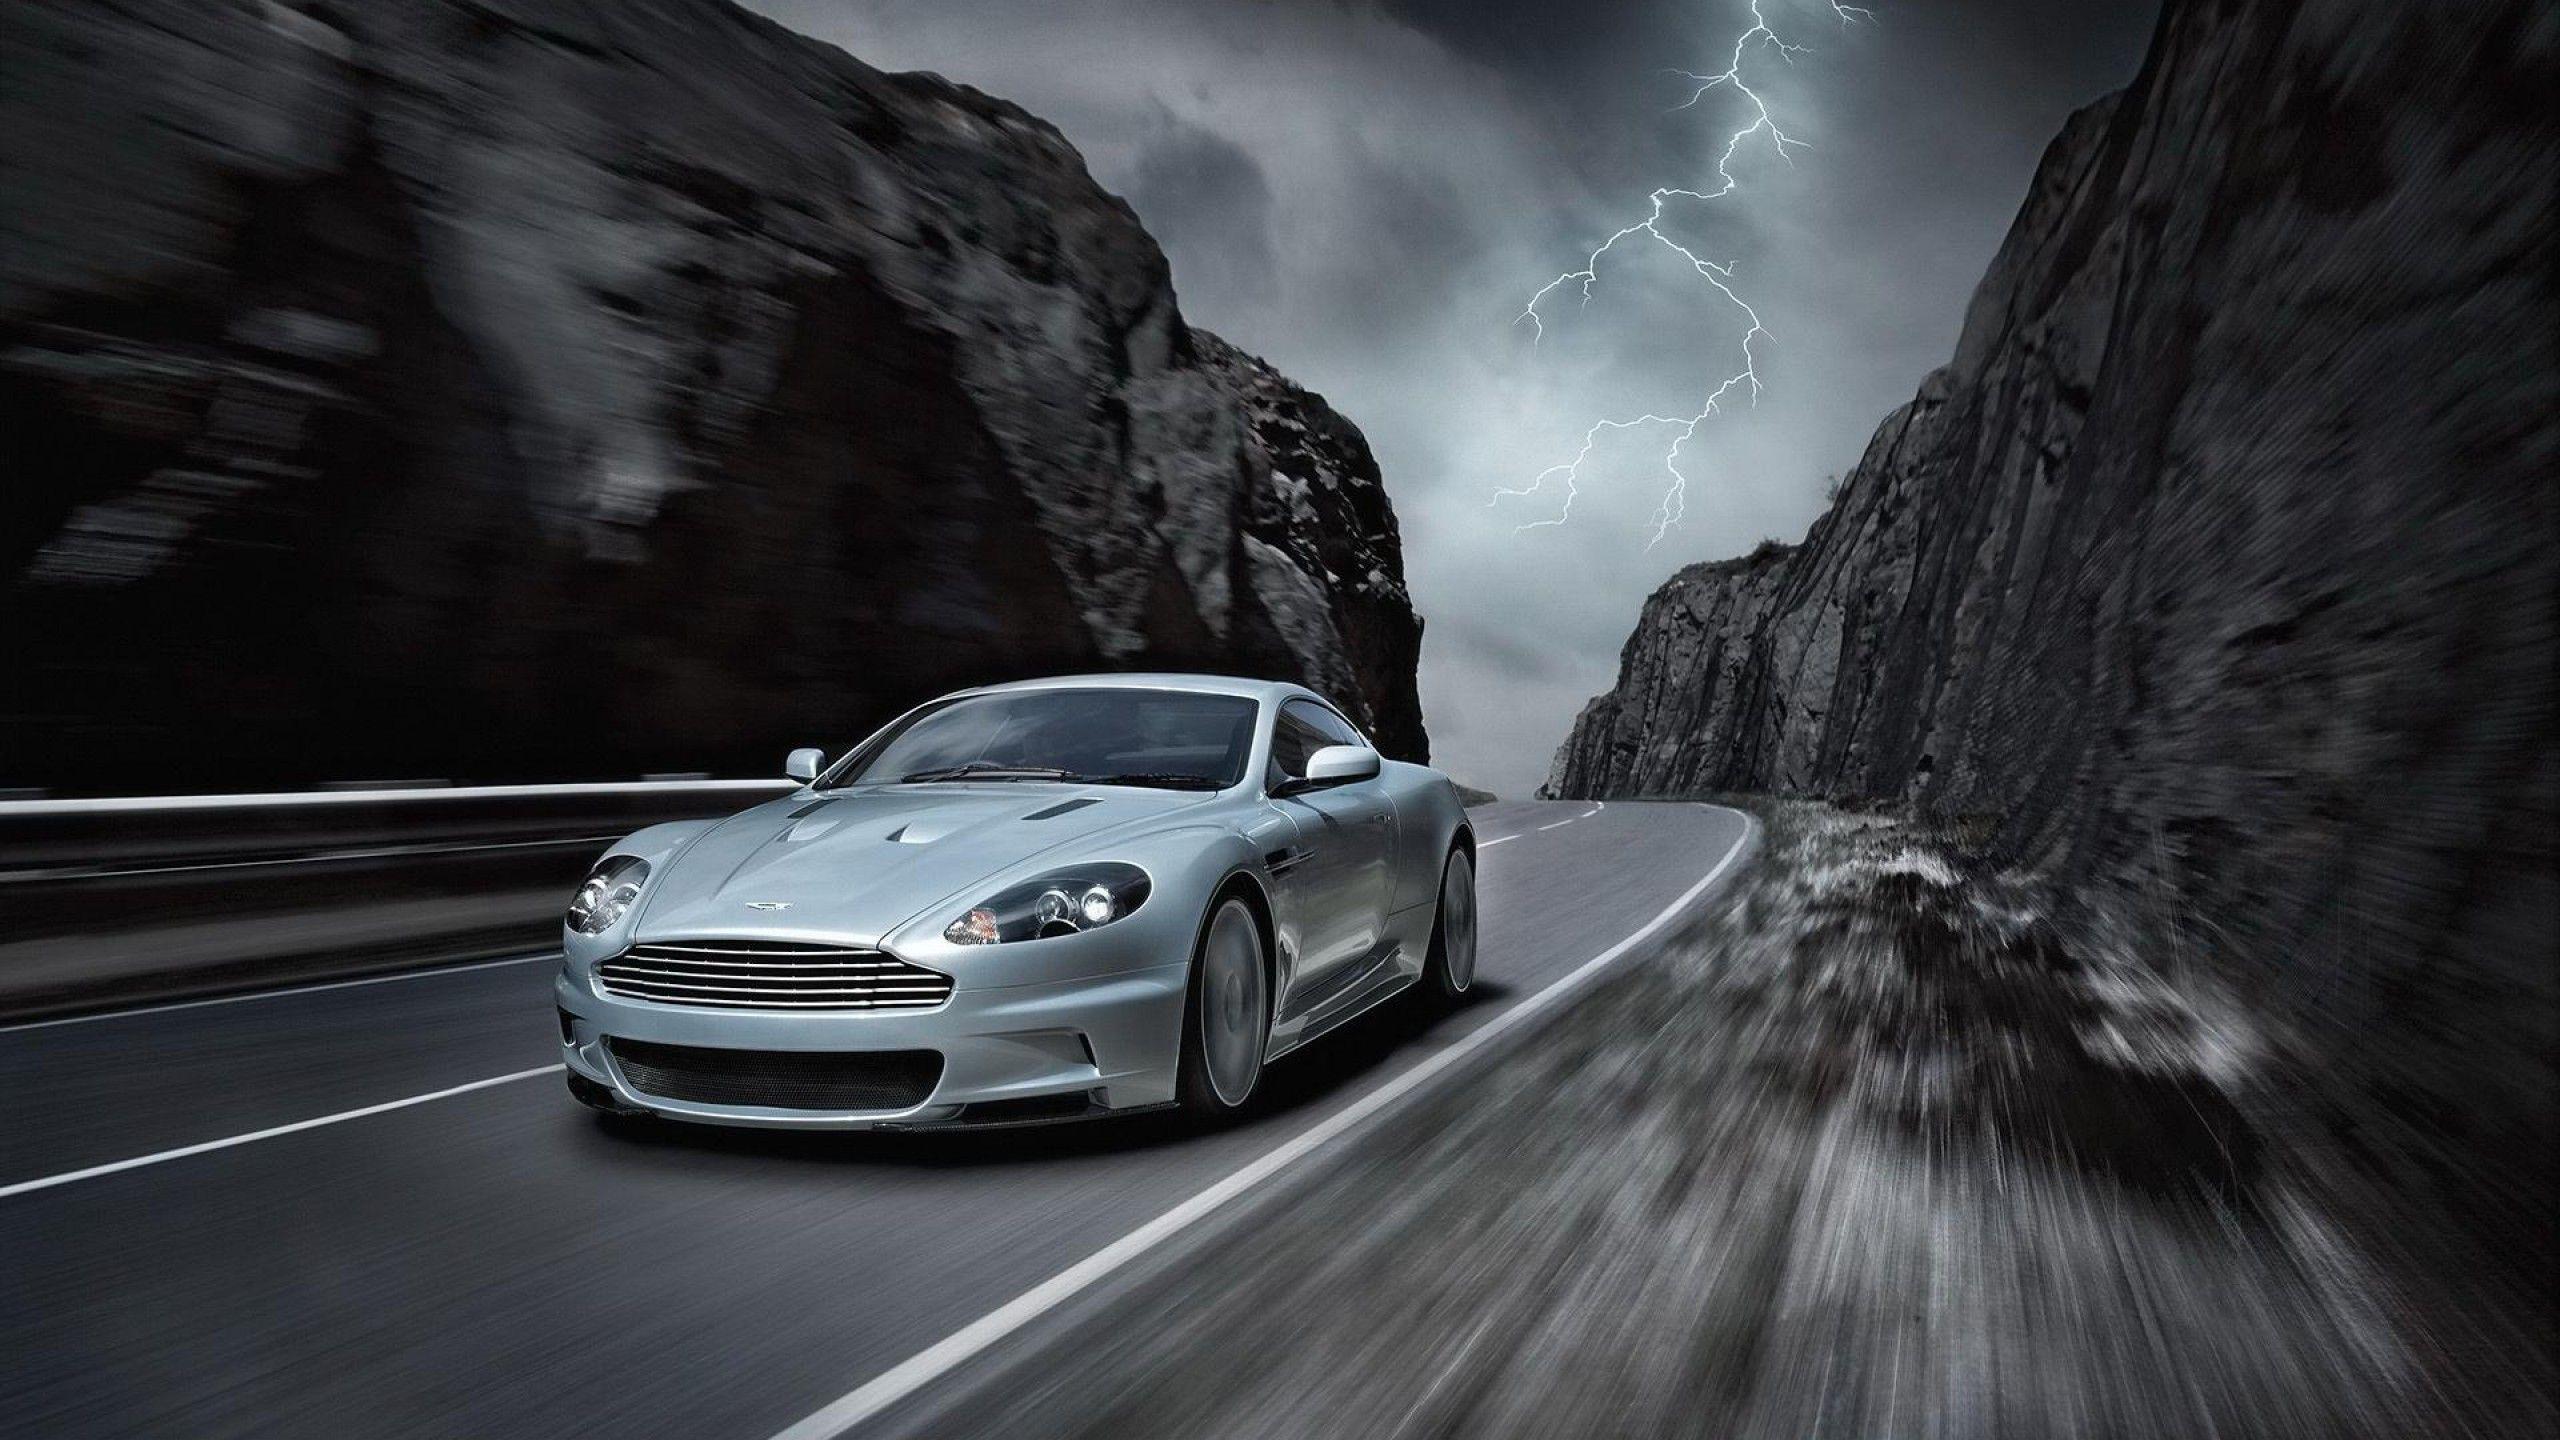 Aston Martin Wallpapers Find Best Latest Aston Martin Wallpapers